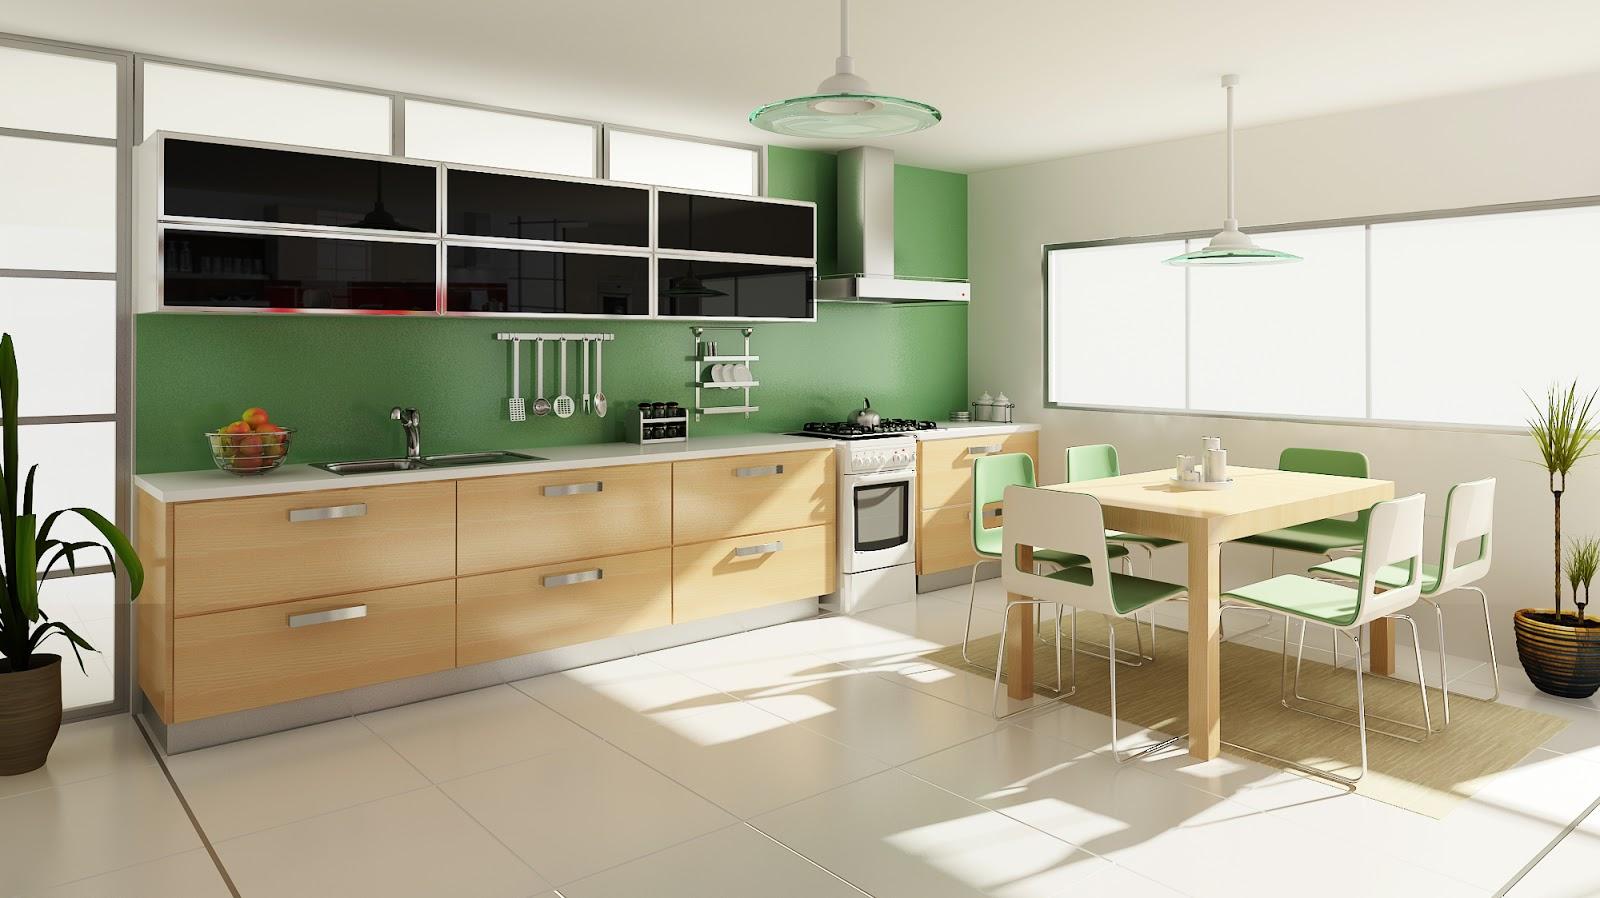 Arquitectura en im genes 3d dise o de interiores cocinas for Diseno de interiores en 3d